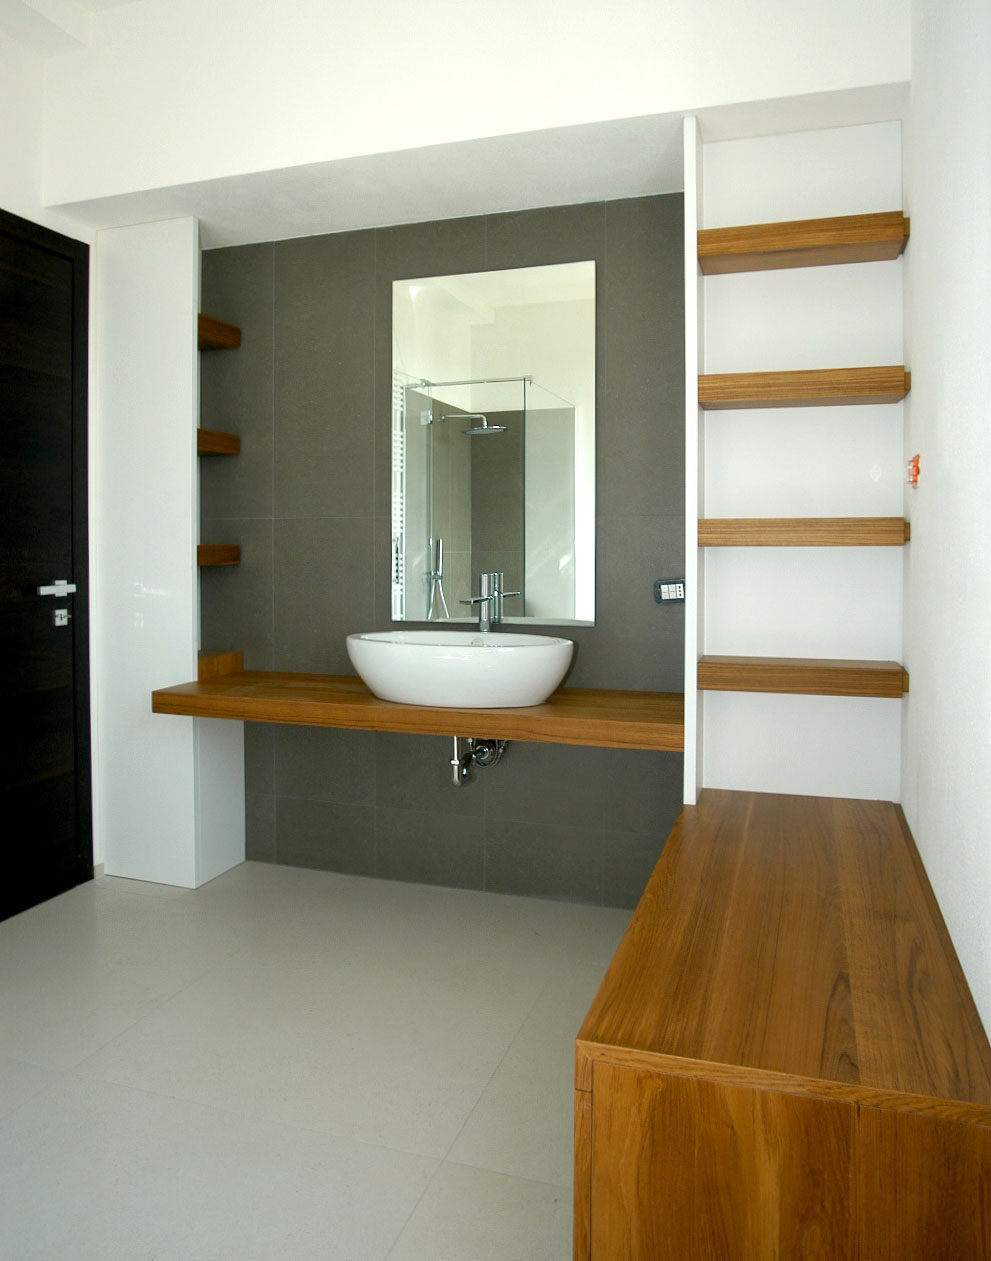 Bettoli arredi e pavimenti bagni bettoli arredi e pavimenti - Arredo bagno in legno ...